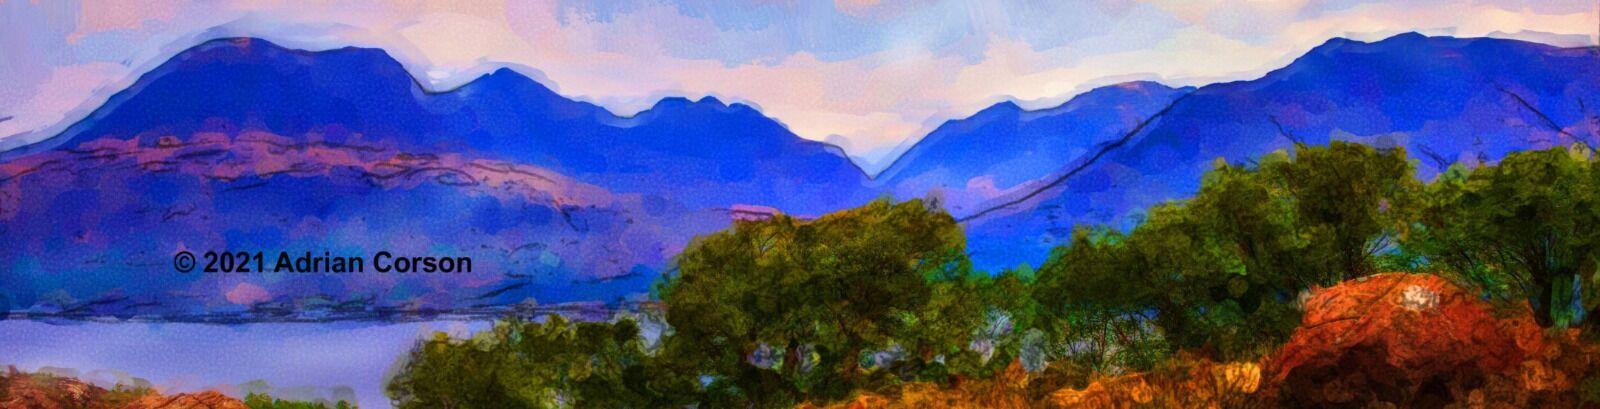 181-blue mountain skyline